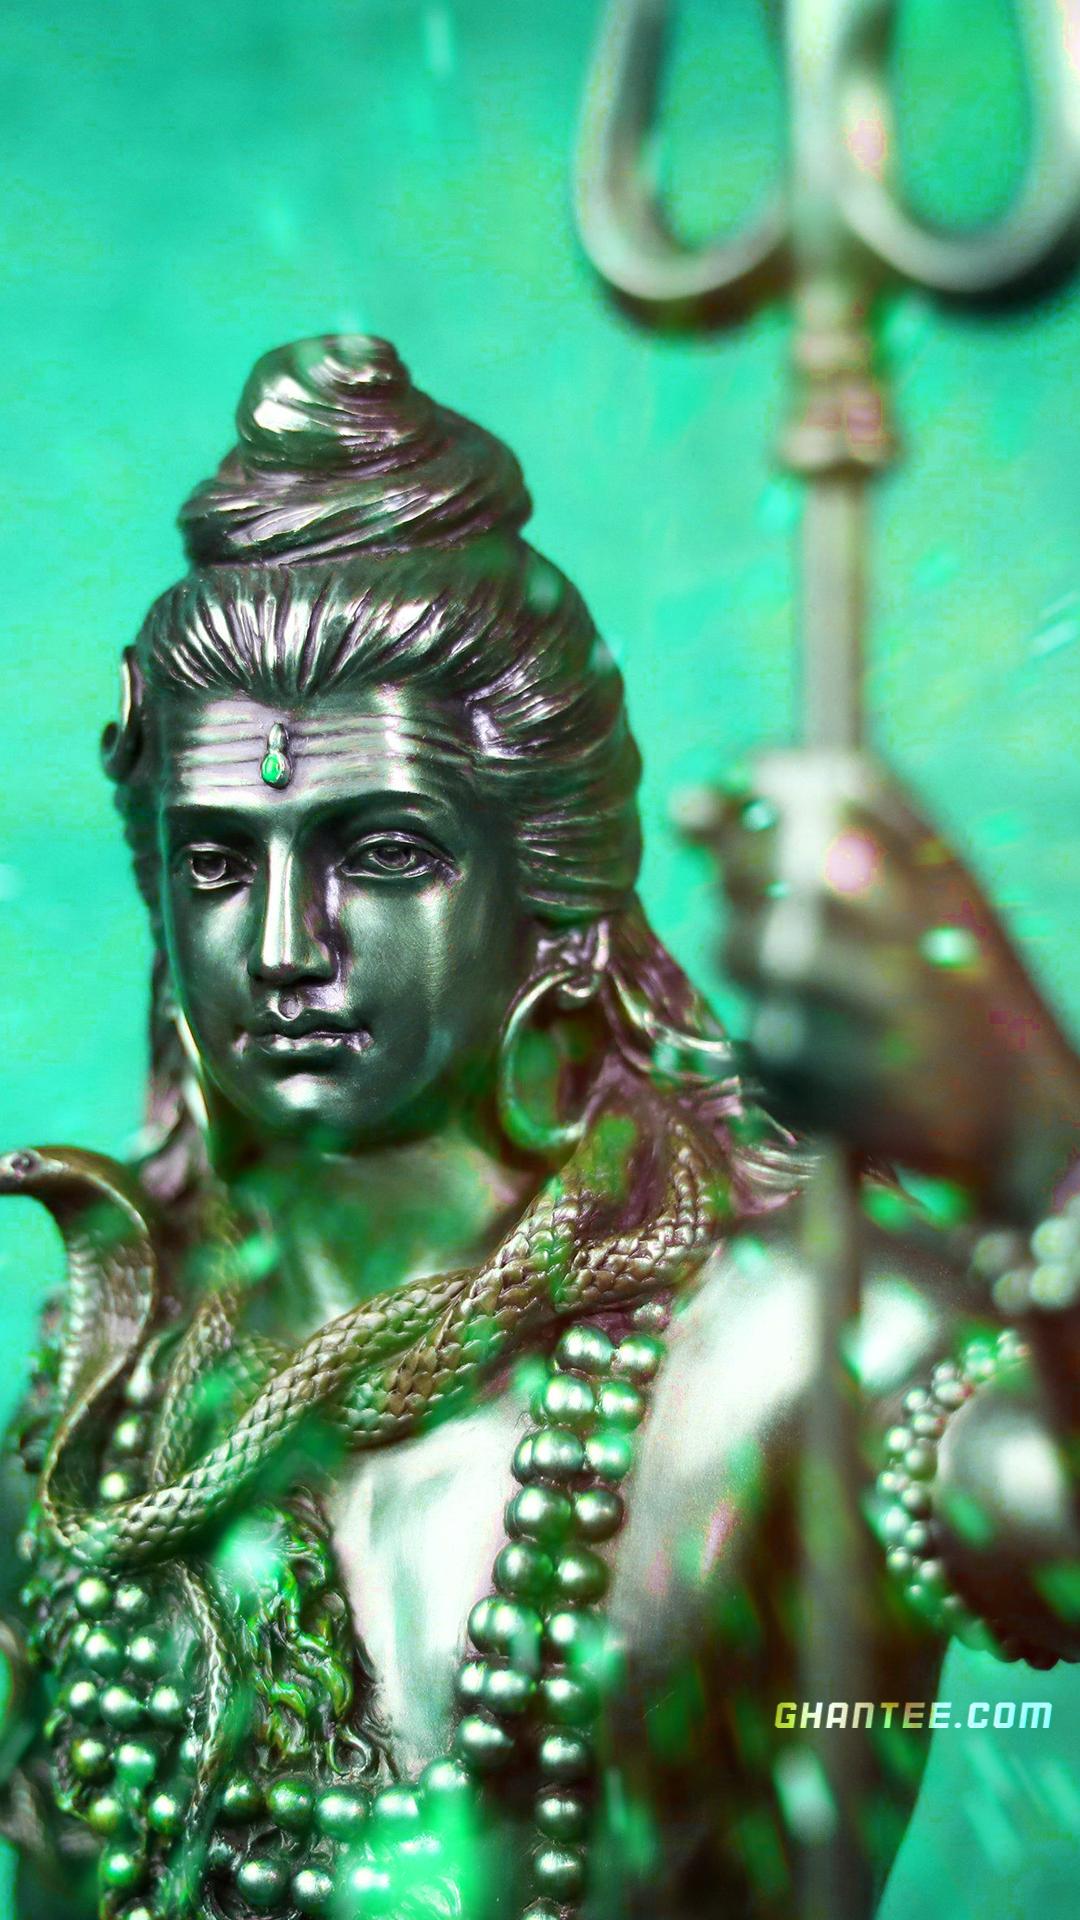 image of mahadev